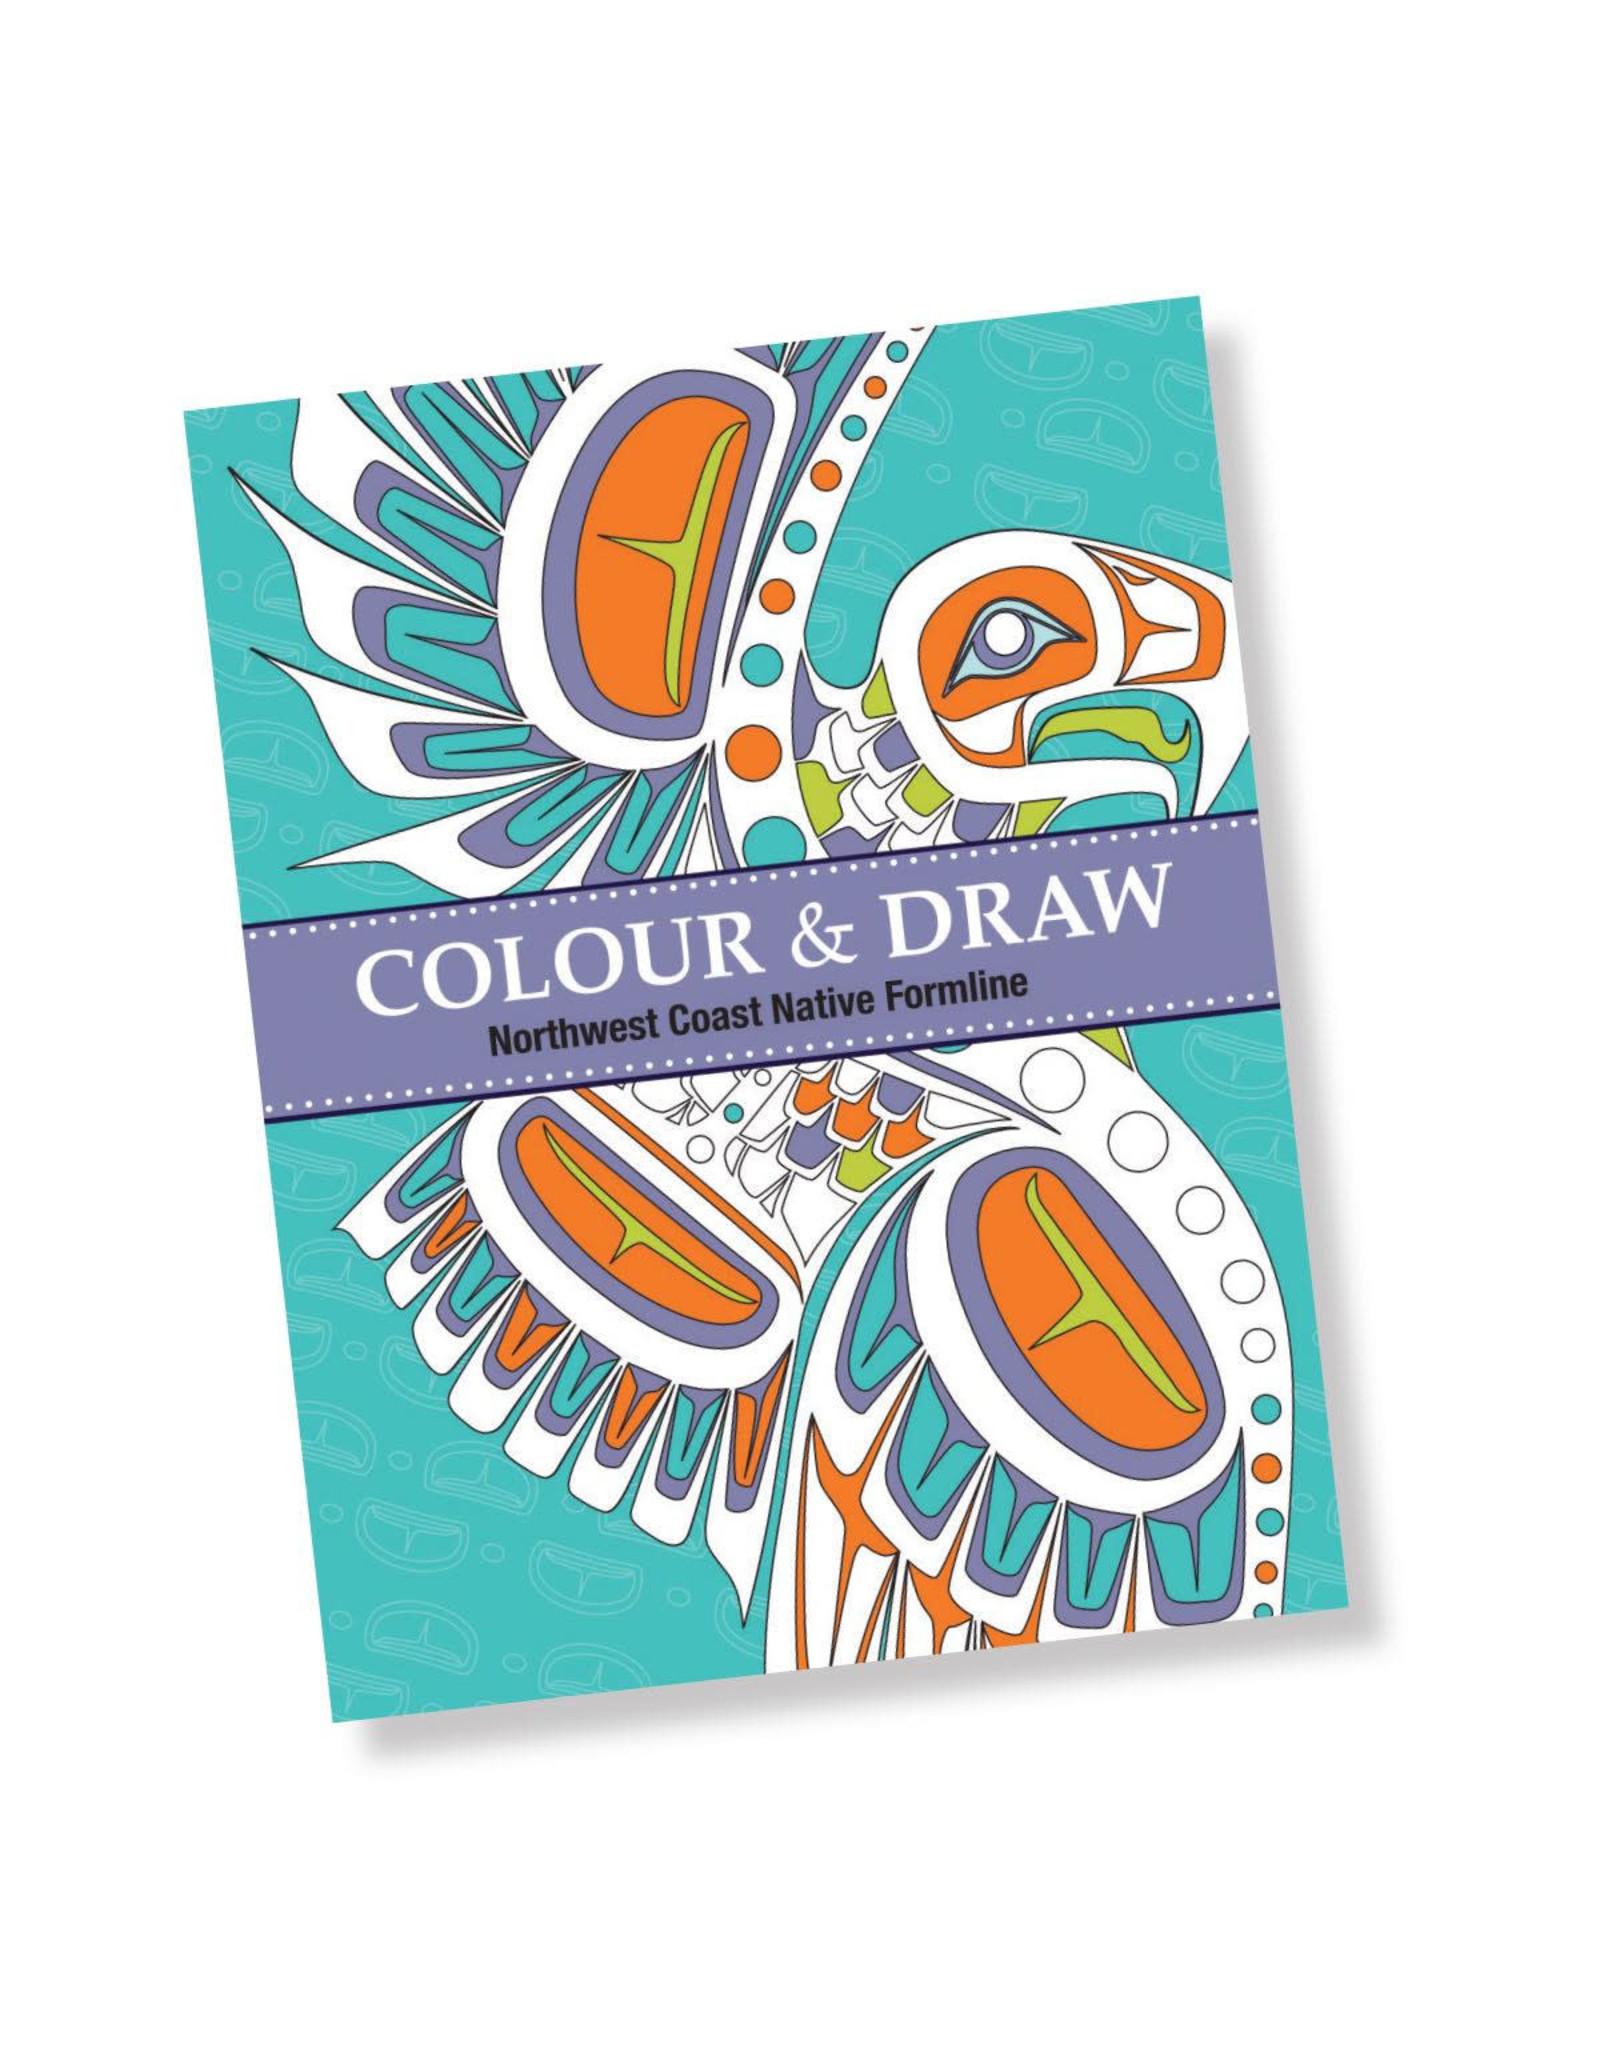 Colour & Draw - Northwest Coast Native Formline